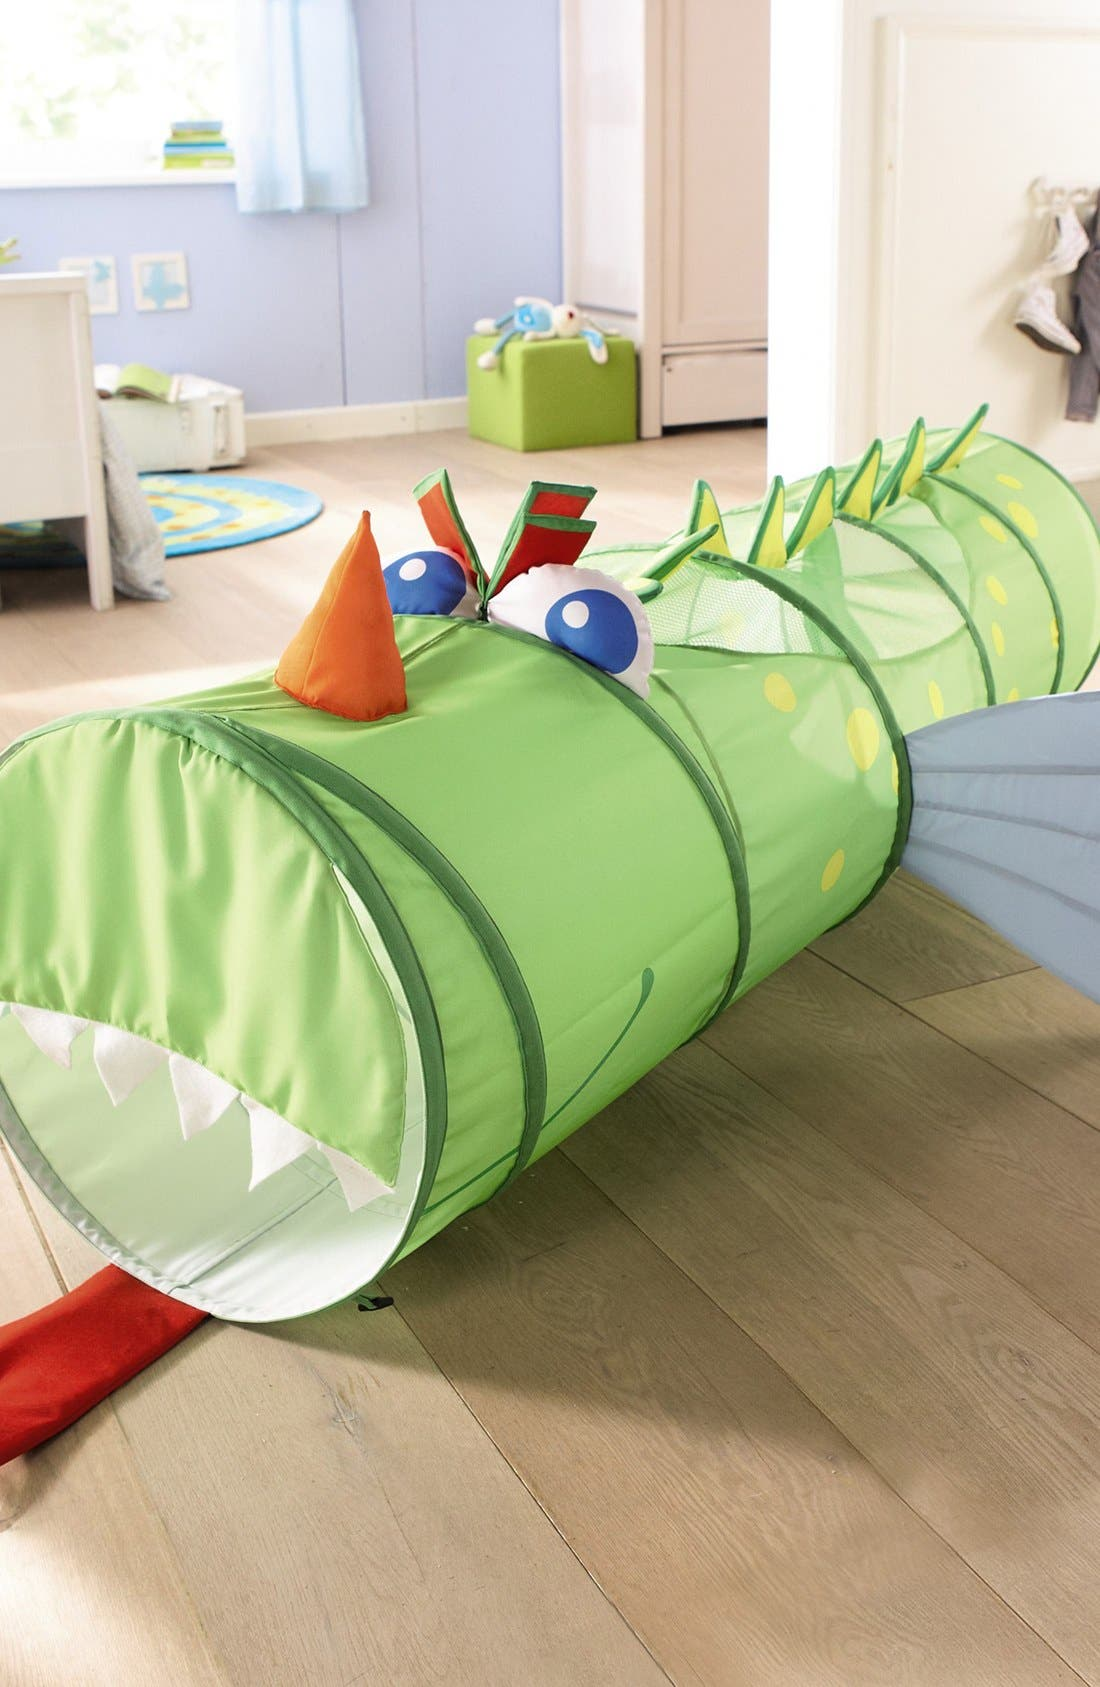 'Croco Kuno' Dragon Crawling Tunnel,                             Alternate thumbnail 3, color,                             Green